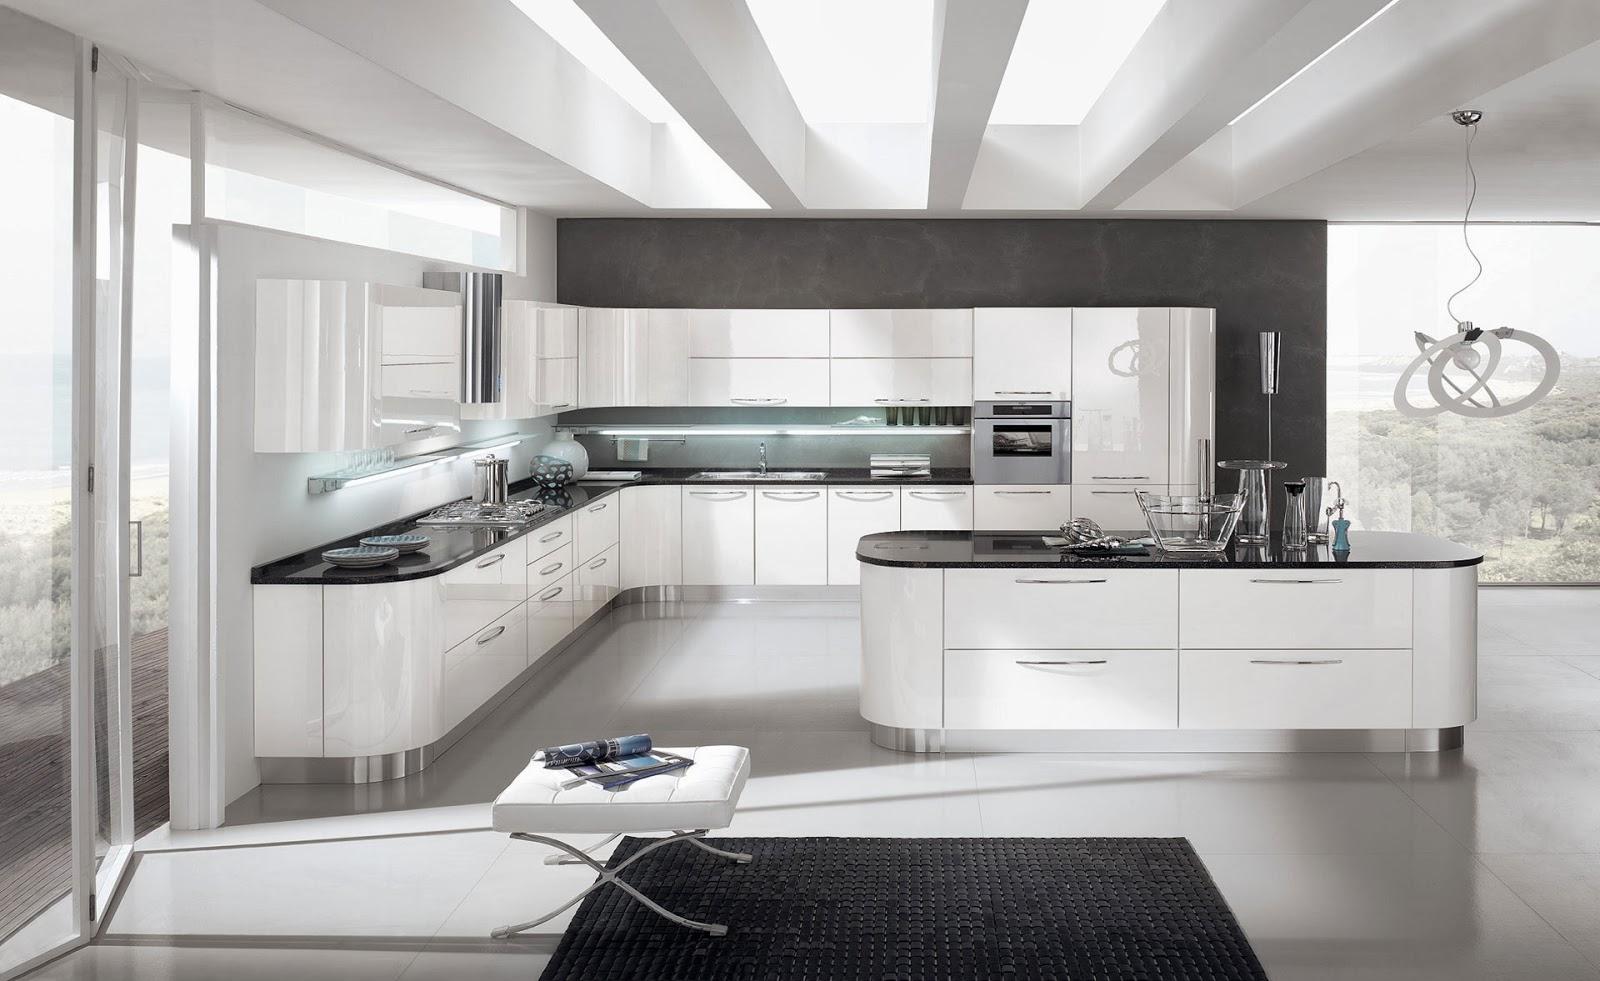 Cucina Moderna Napoli.Centro Cucine Napoli Cucine Napoli Moderne